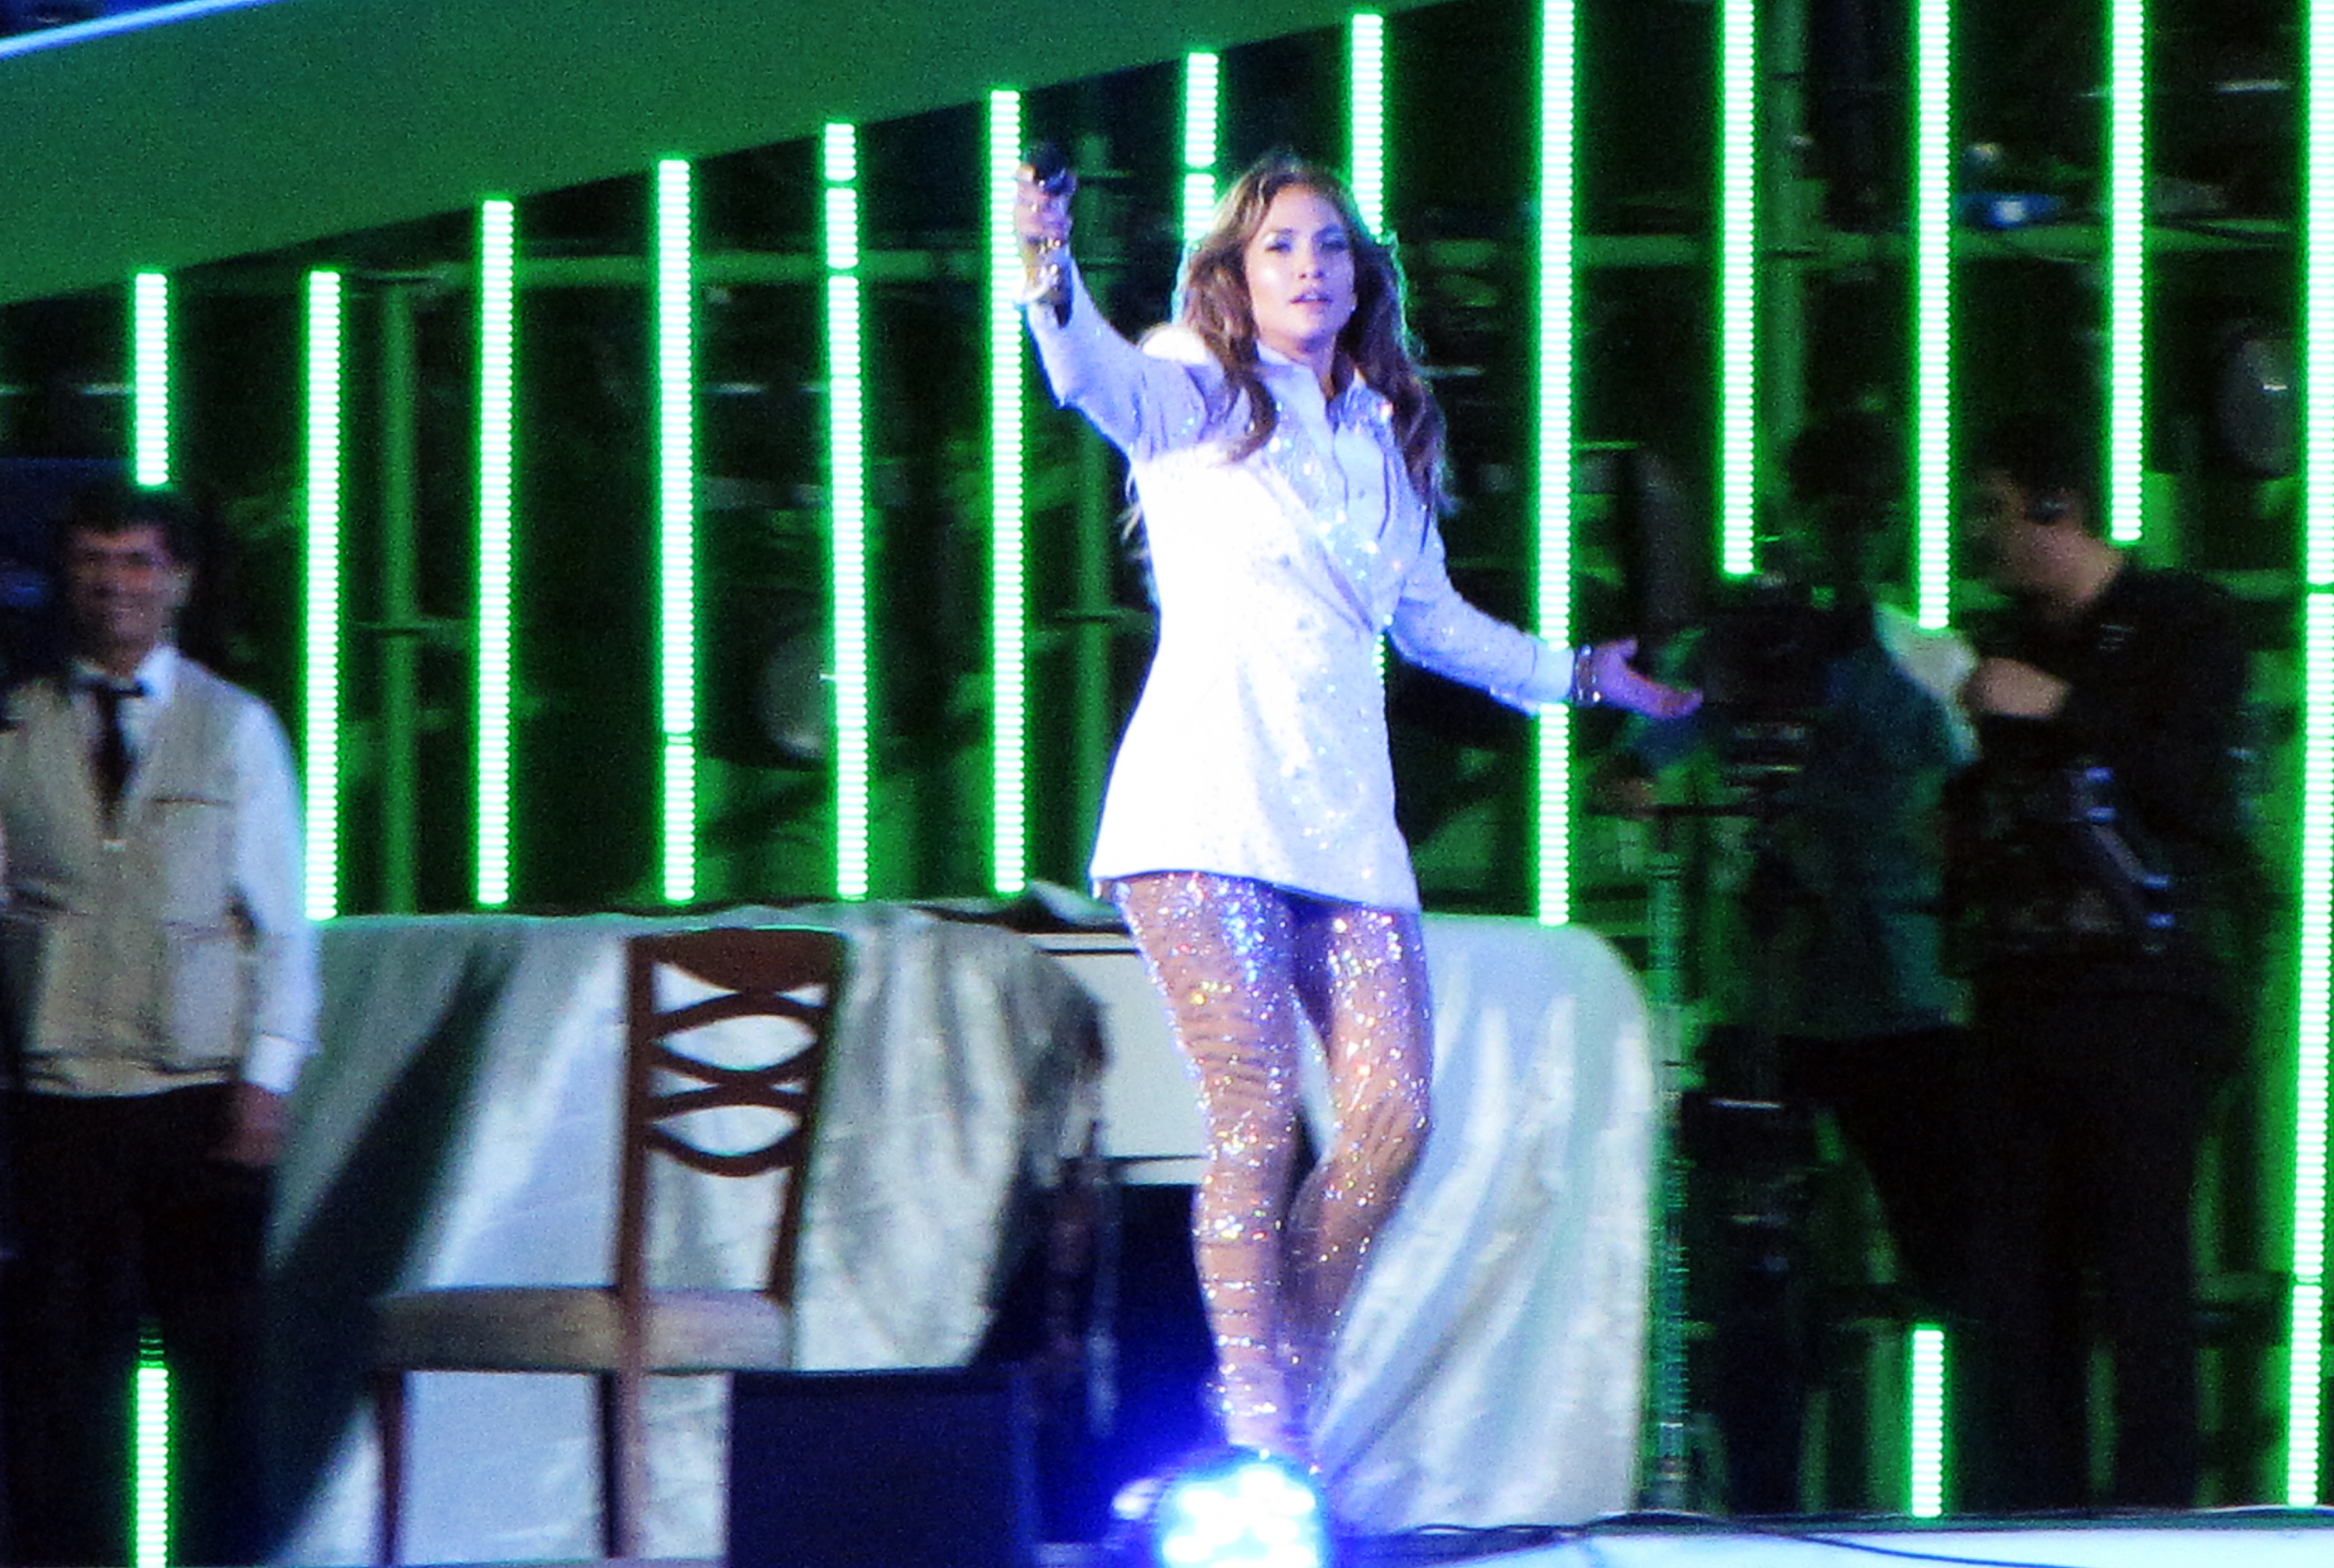 Jennifer Lopez performs at Avaza, near the city of Turkmenbashi, Turkmenistan on June 29, 2013.